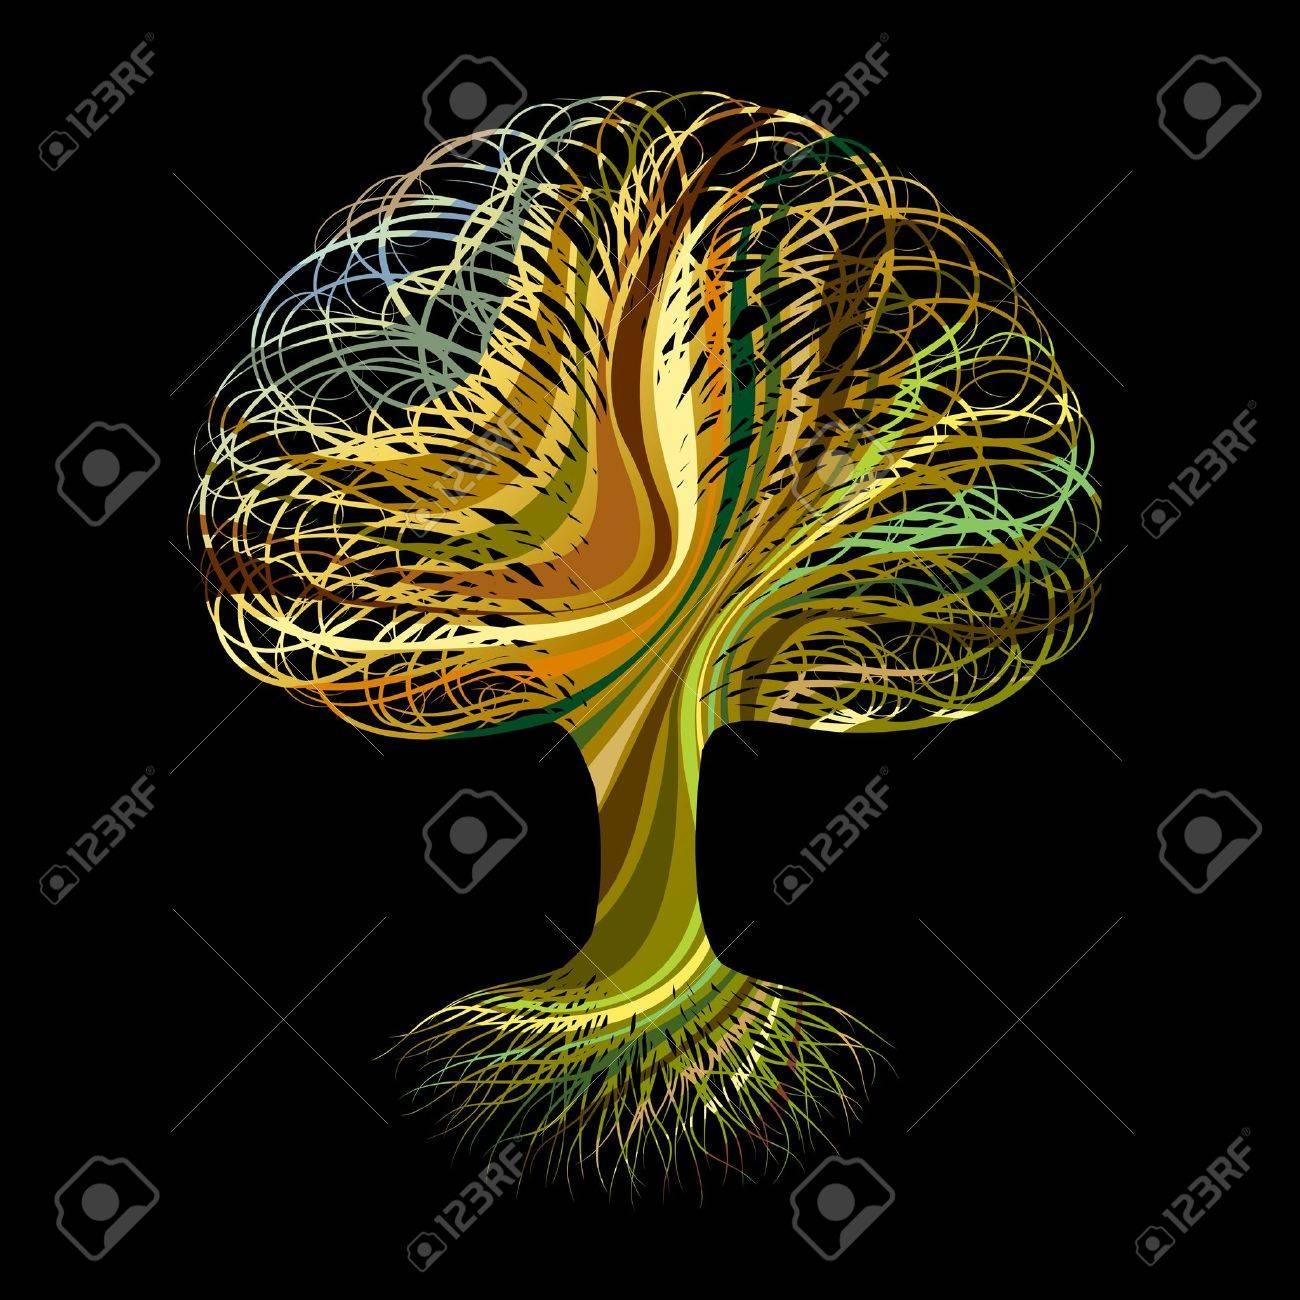 Multicolour abstract tree 2 Stock Vector - 11009043